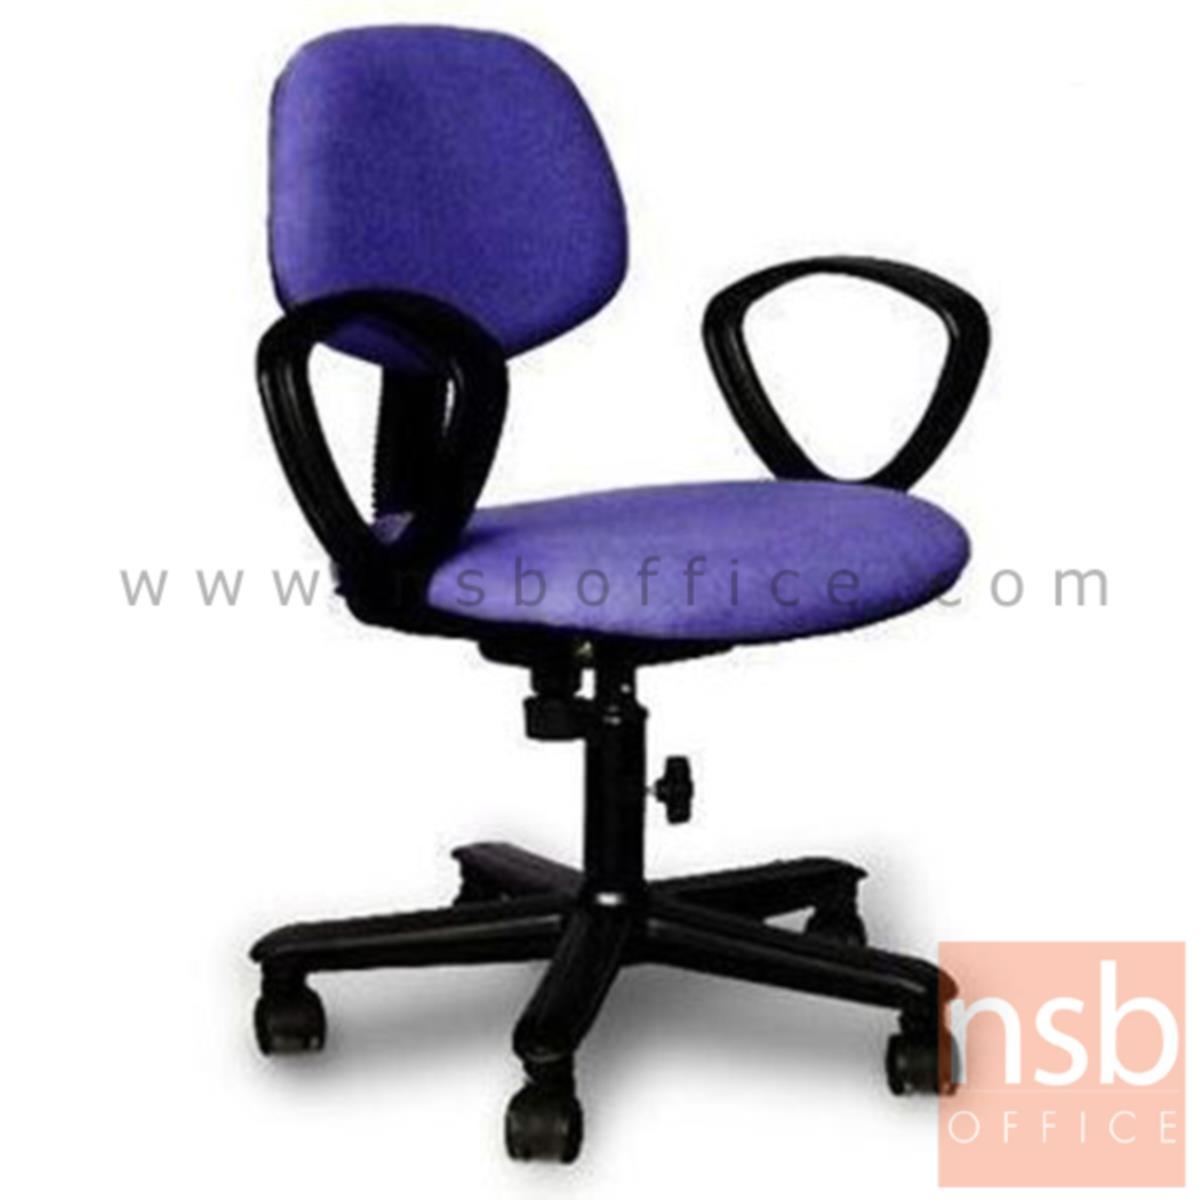 B03A471:เก้าอี้สำนักงาน  รุ่น Bush (บุช)  มีก้อนโยก ขาพลาสติก